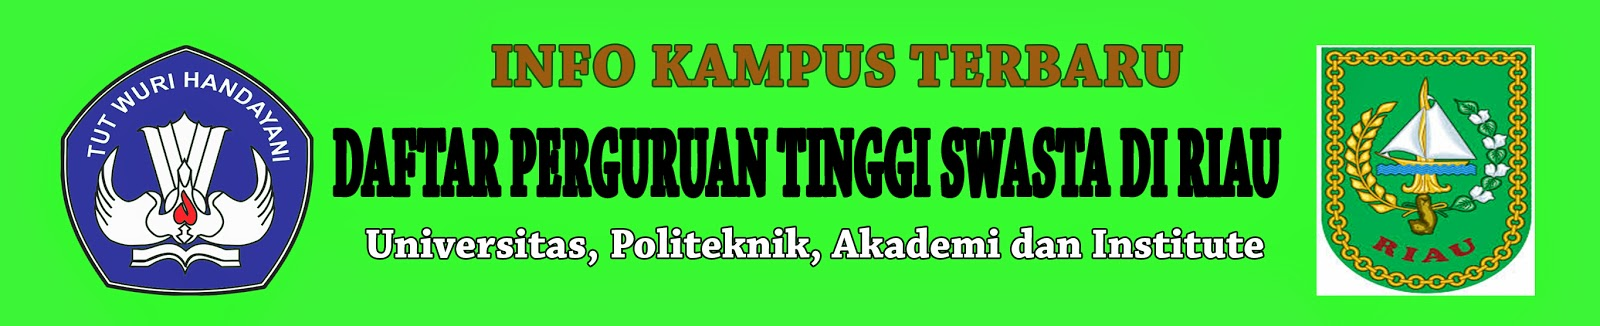 Daftar Lengkap Perguruan Tinggi Swasta Di Riau